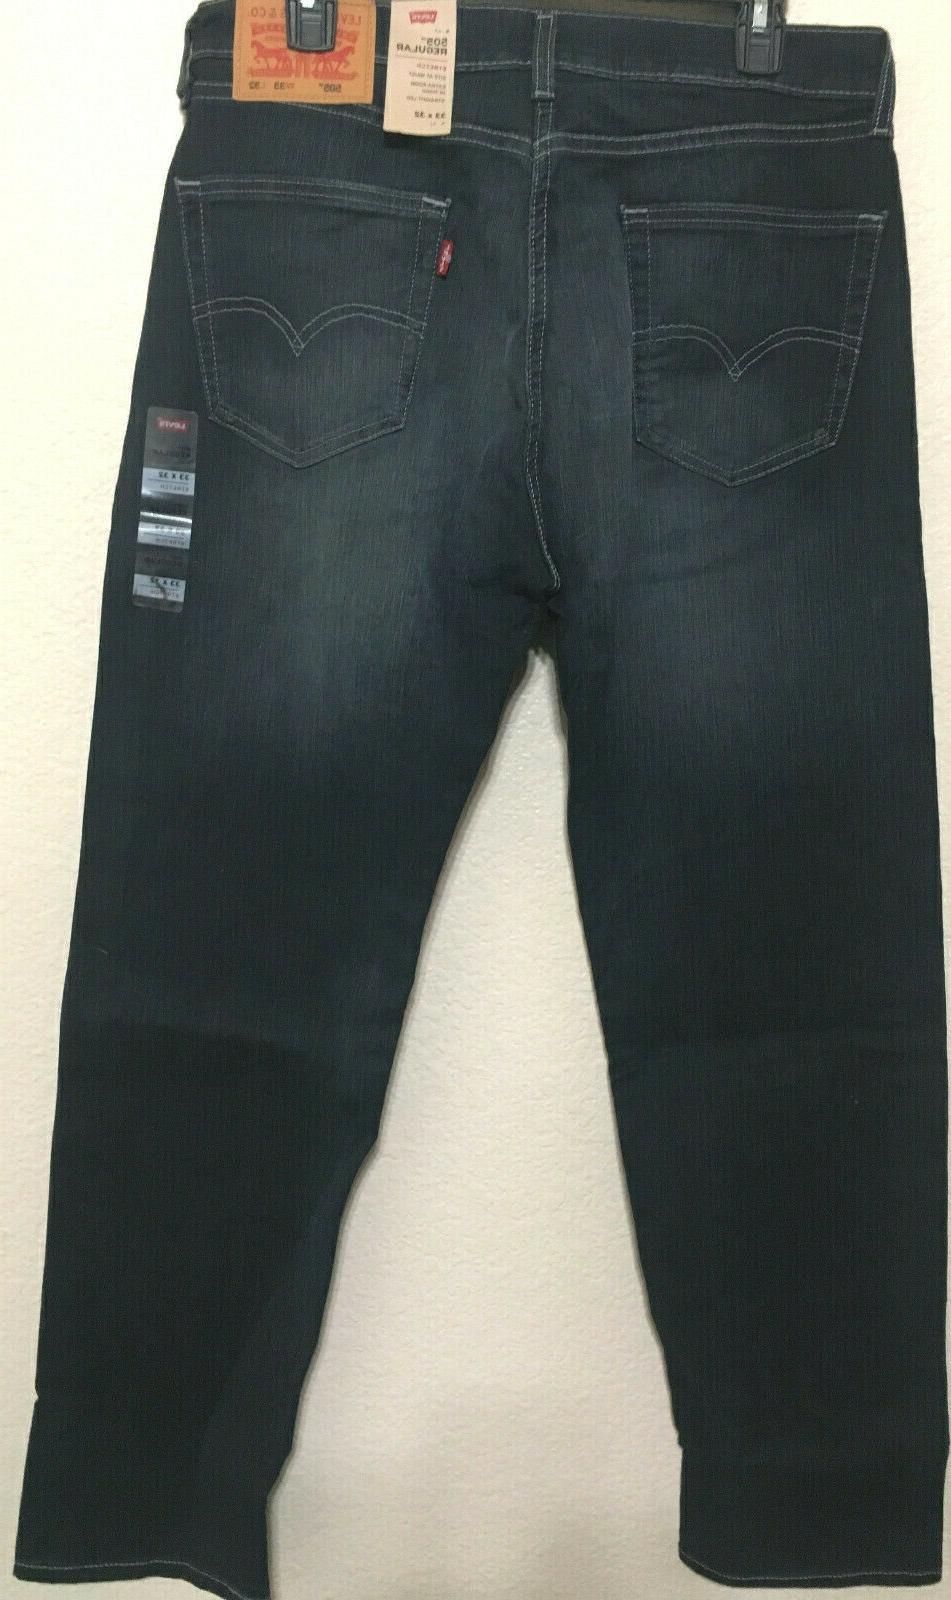 NWT 1330 FIT STRAIGHT LEG D.BLUE STRETCH